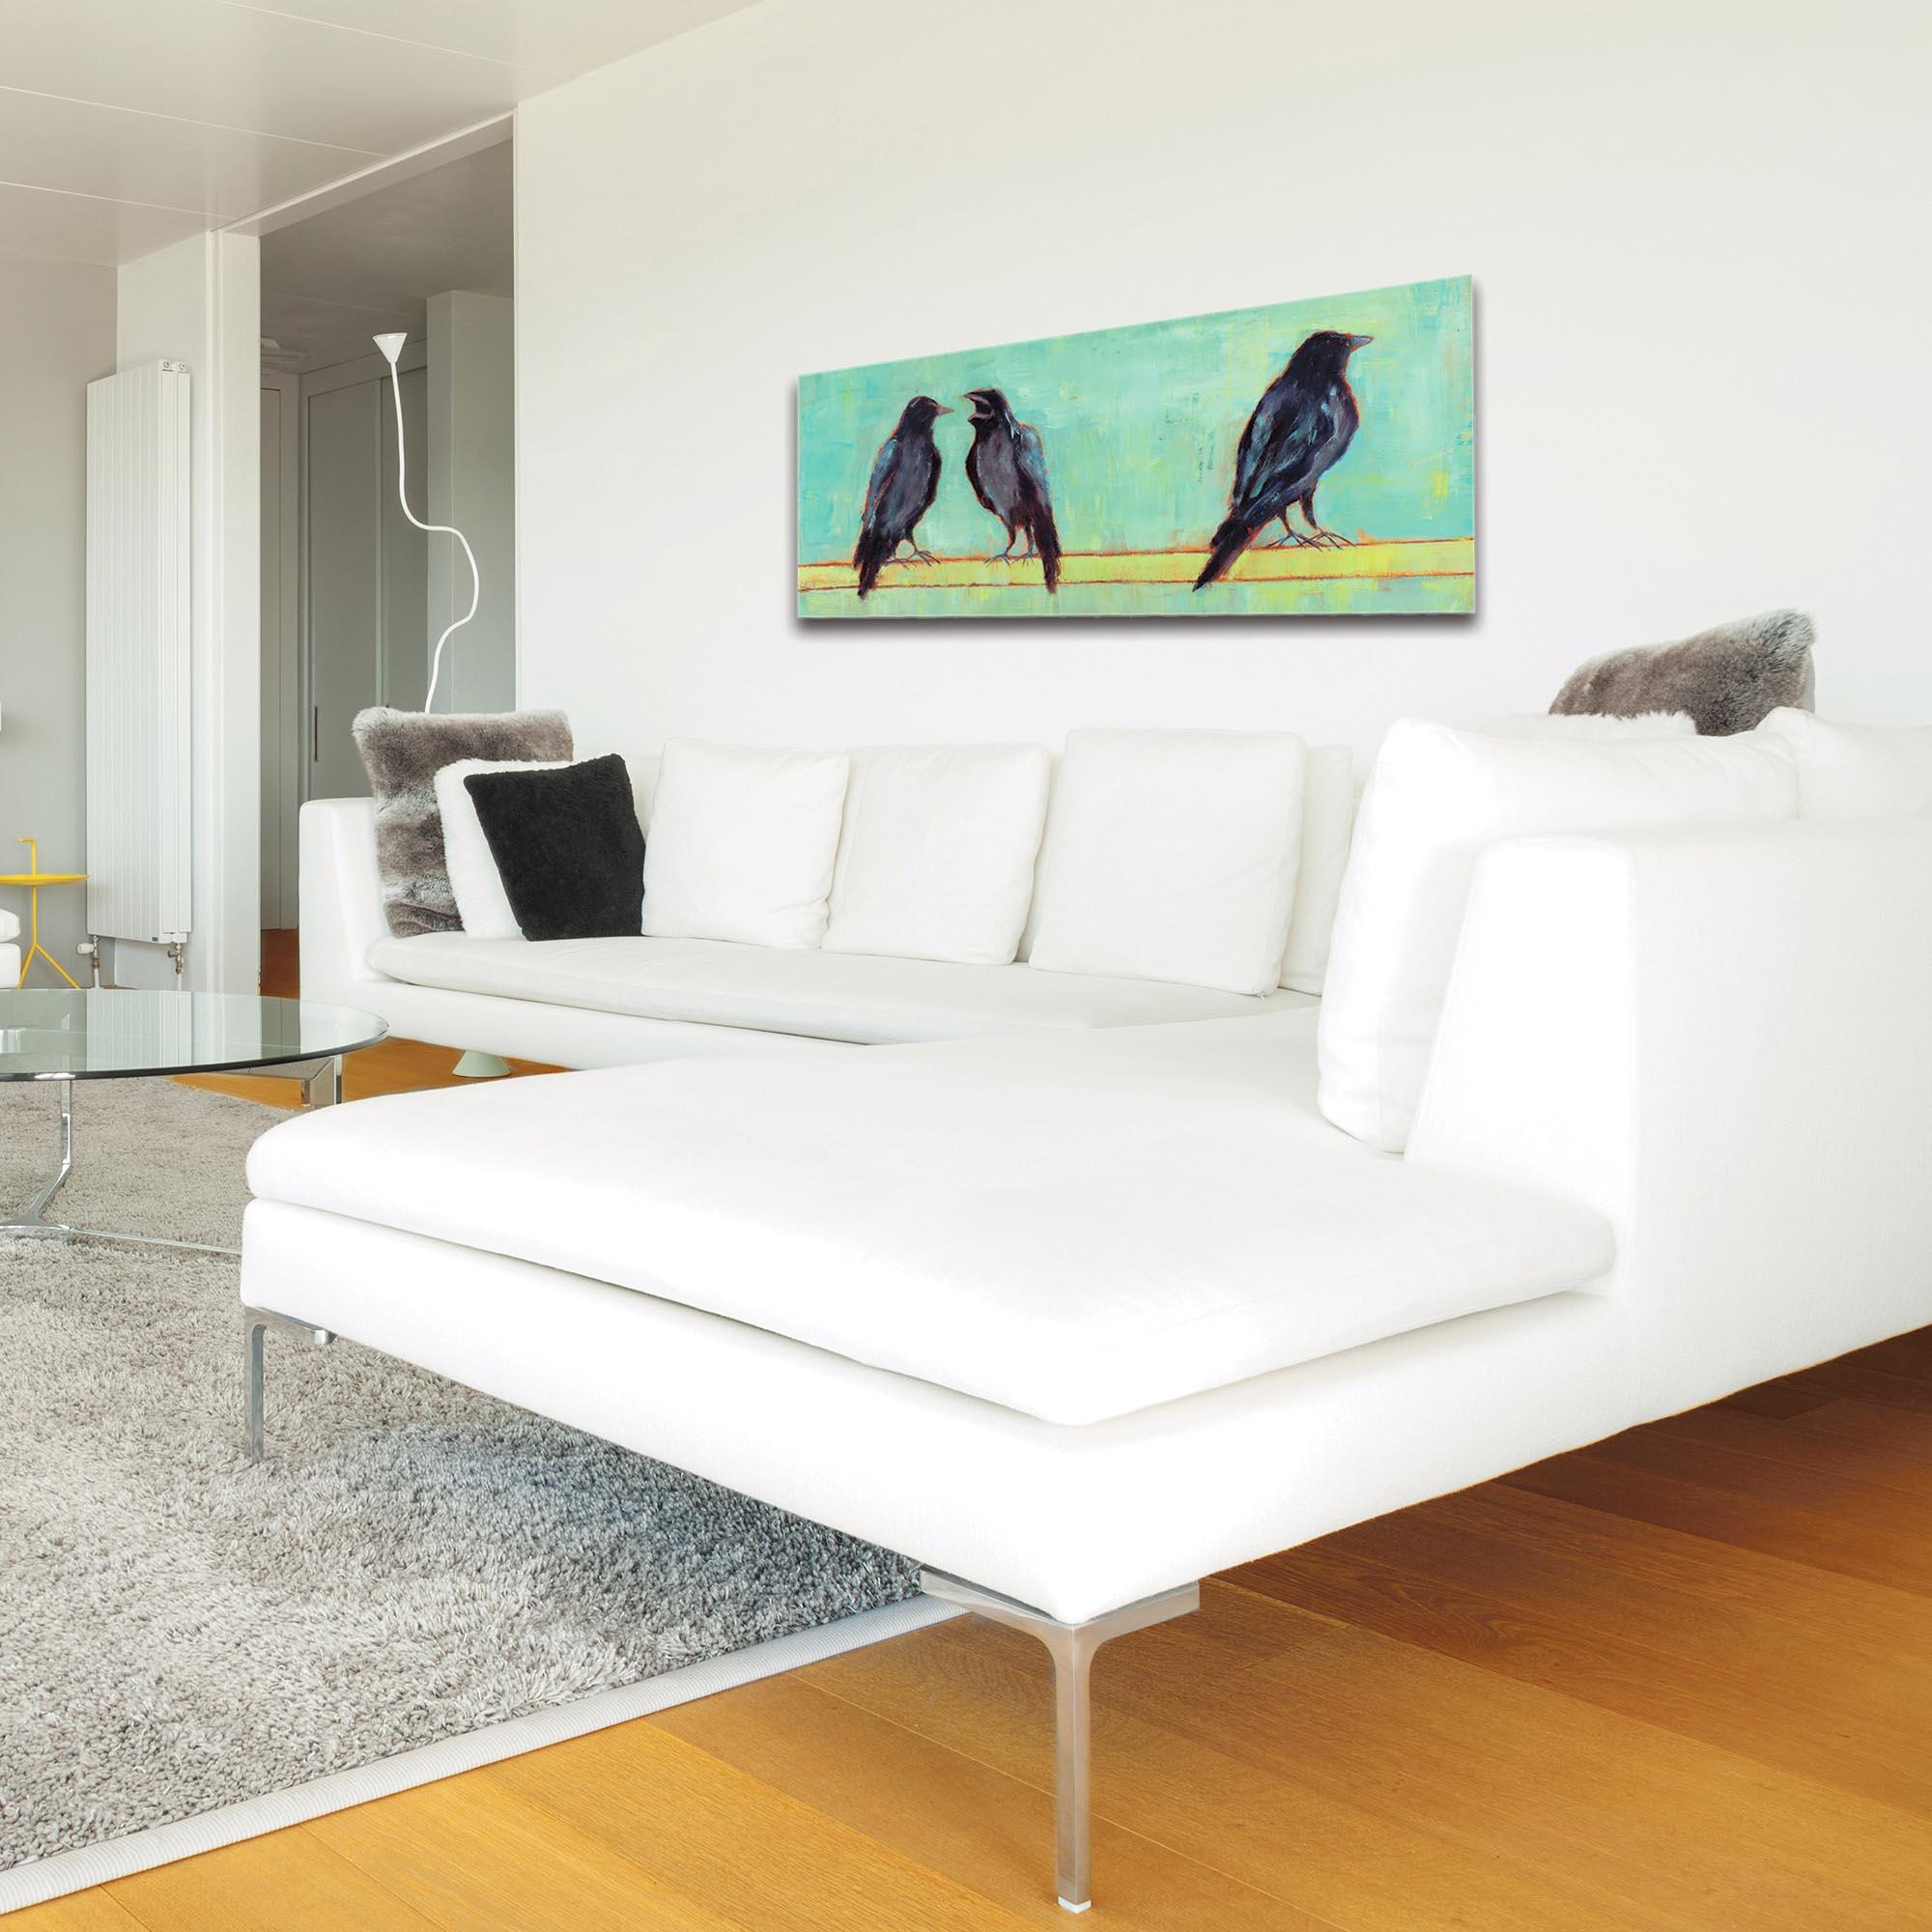 Contemporary Wall Art 'Crow Bar 2 v2' - Urban Birds Decor on Metal or Plexiglass - Image 3